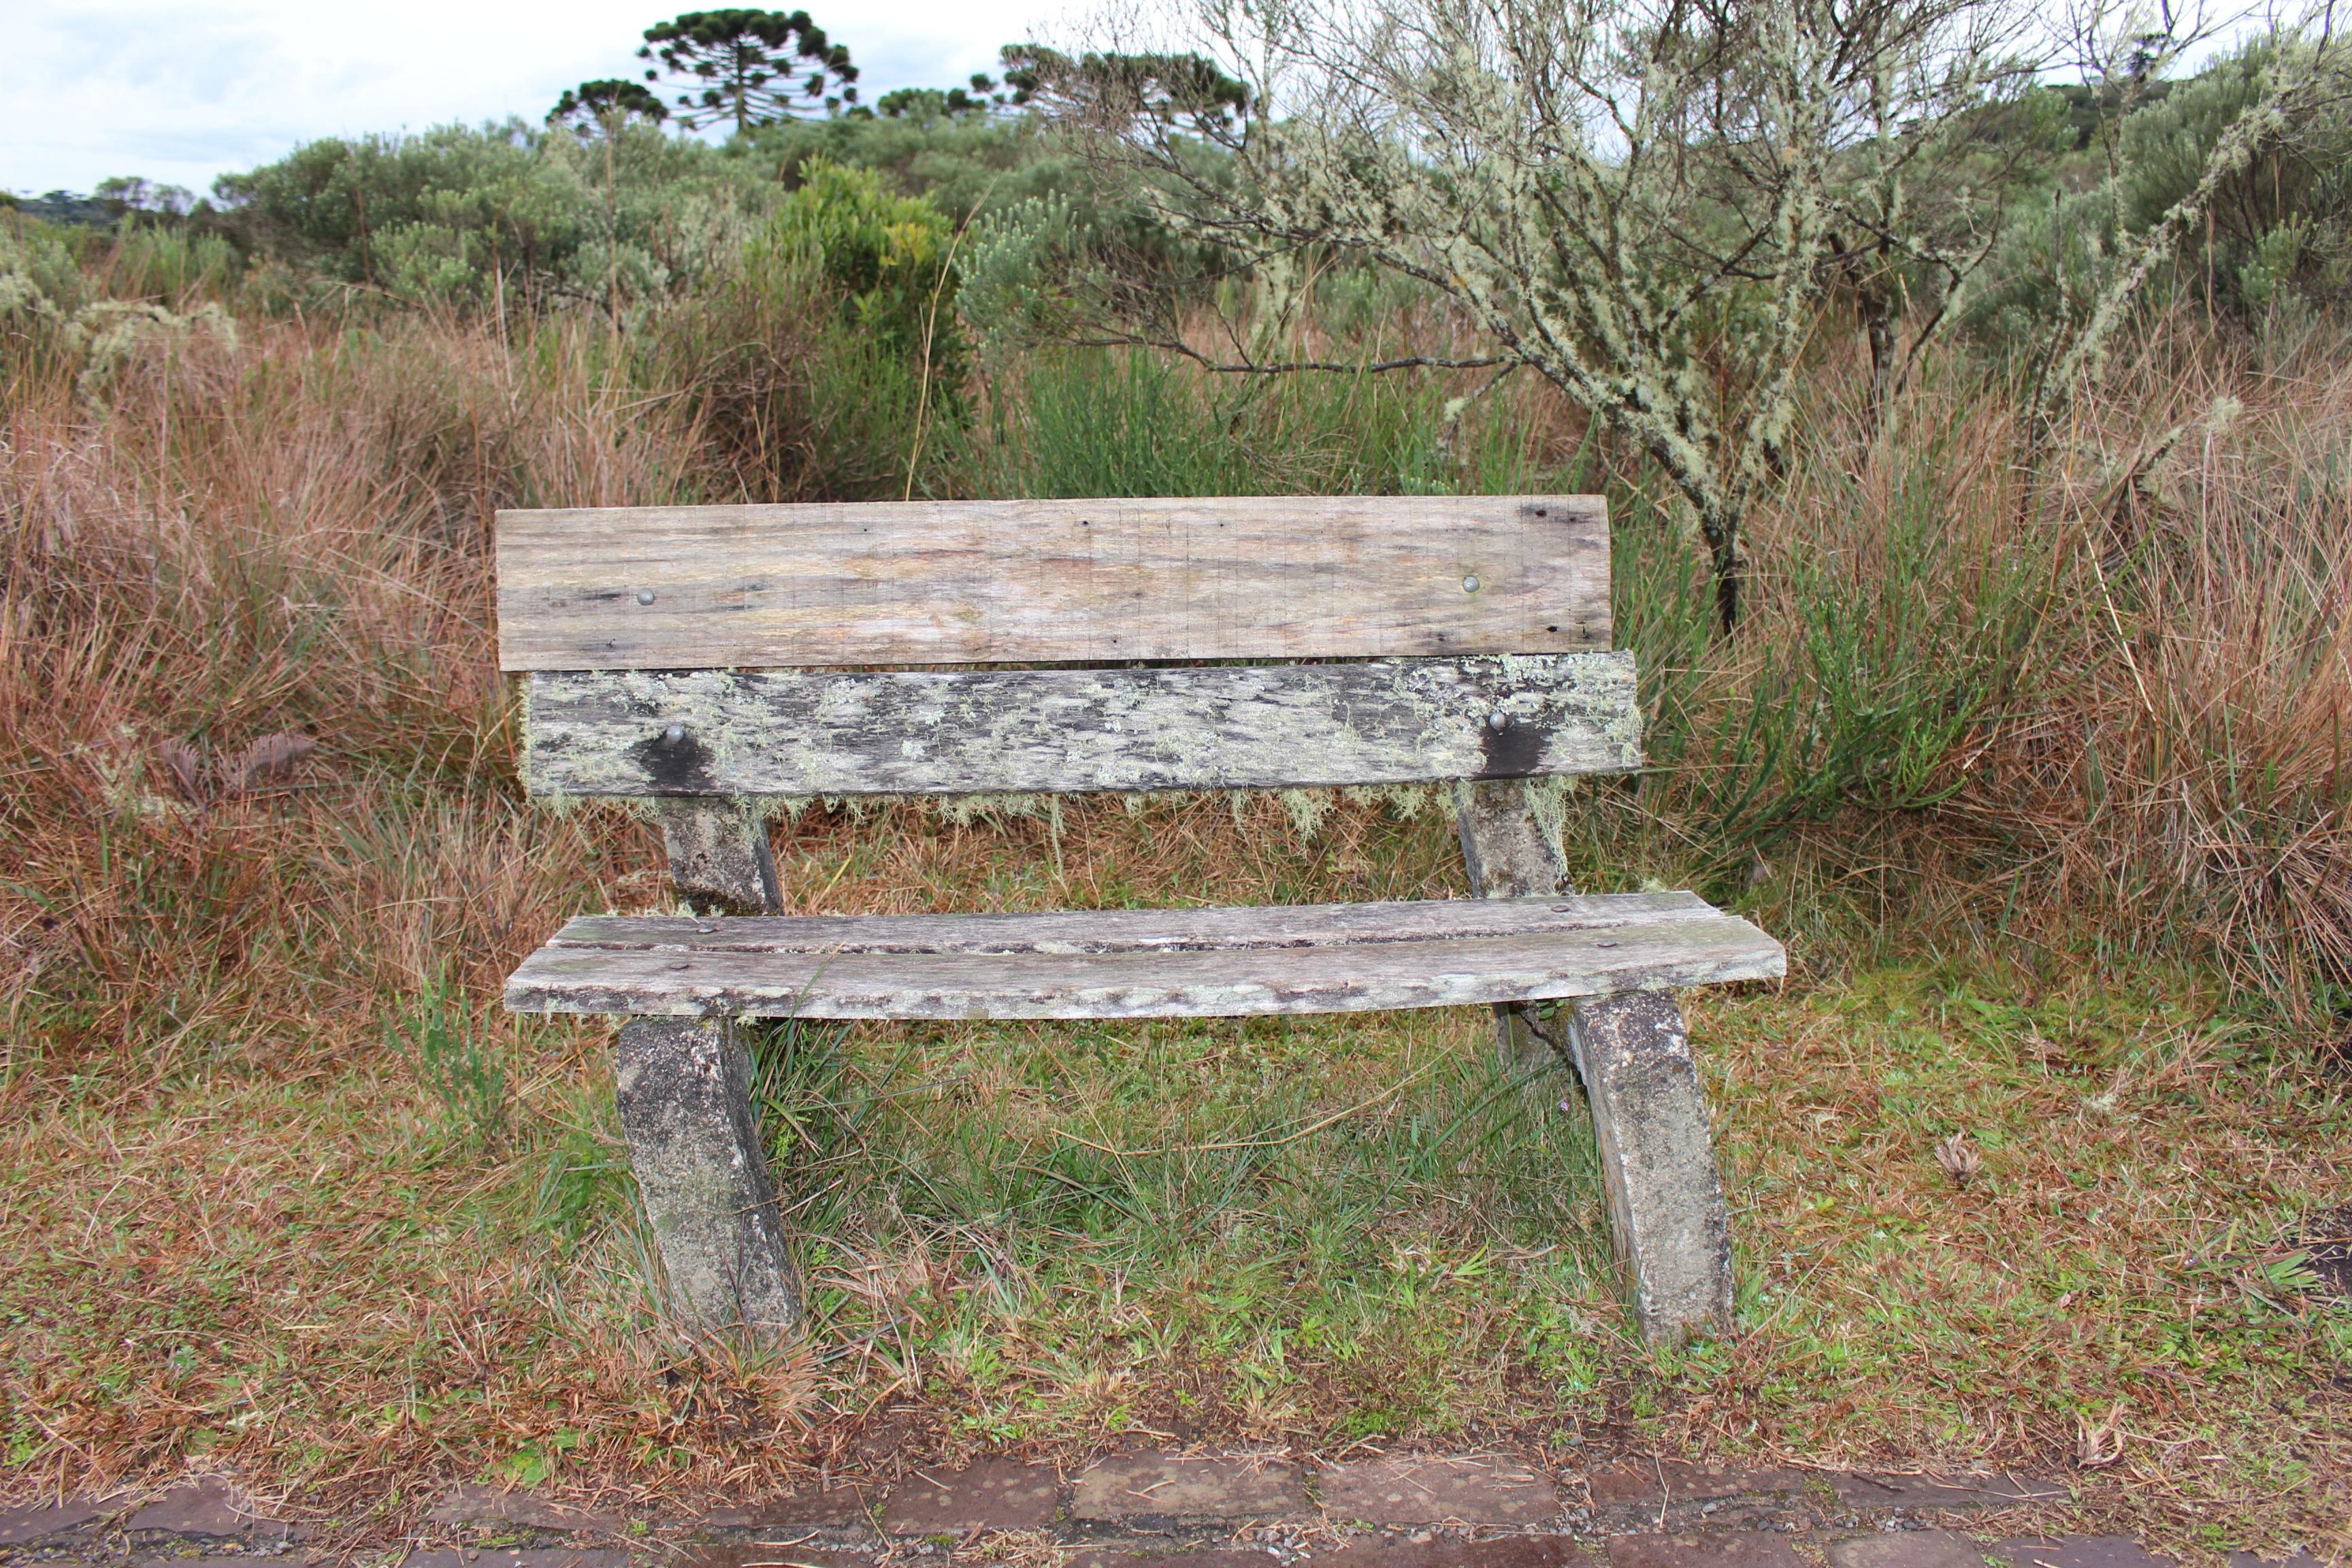 Fotos gratis : mesa, paisaje, madera, banco, campo, mueble ...